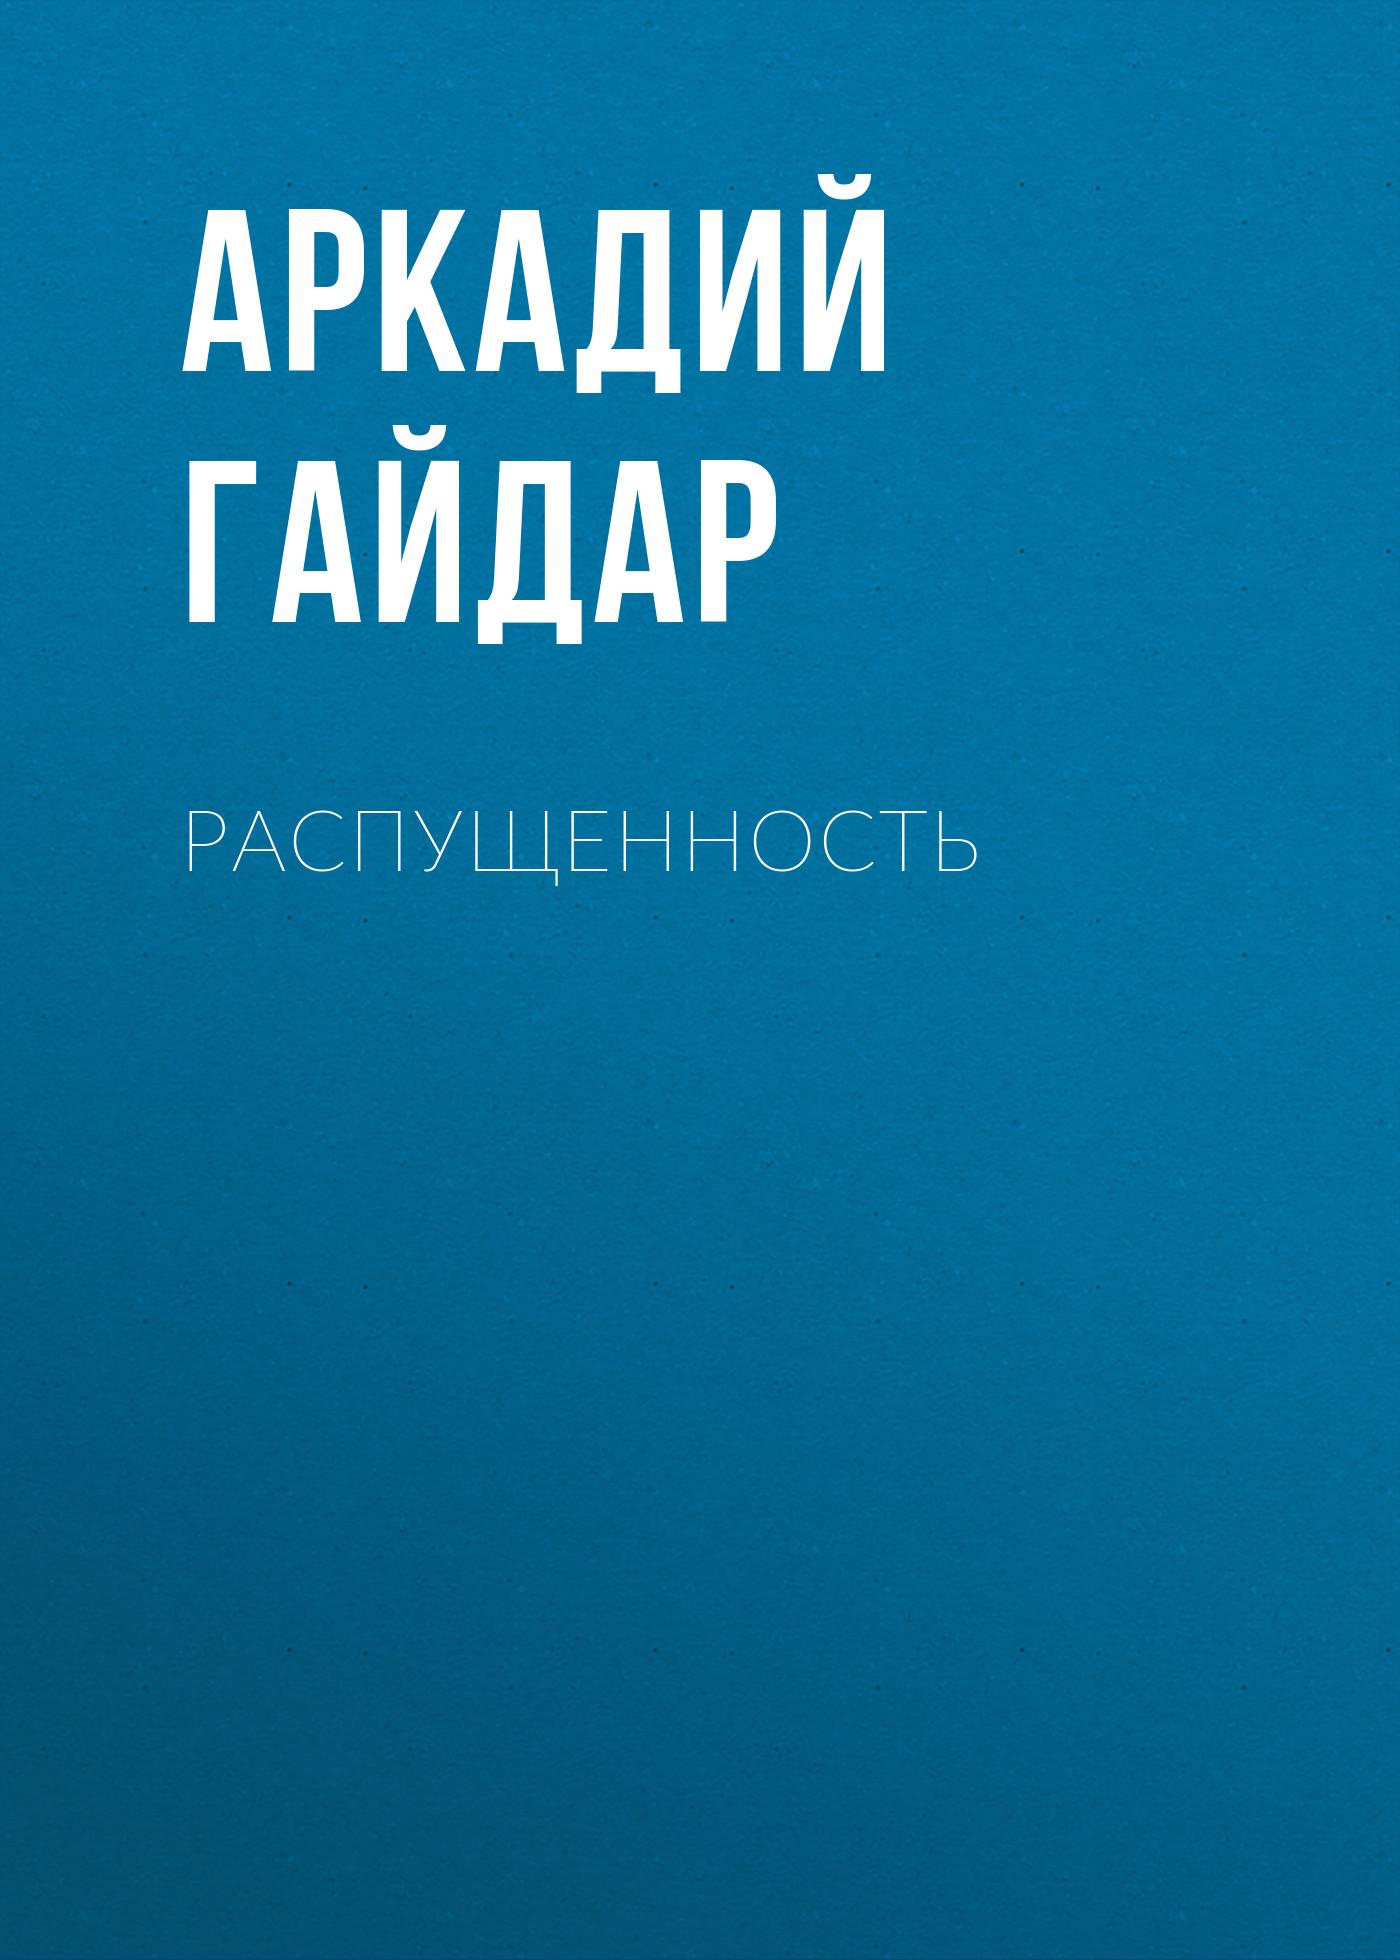 Аркадий Гайдар Распущенность гайдар аркадий петрович тимур и его команда